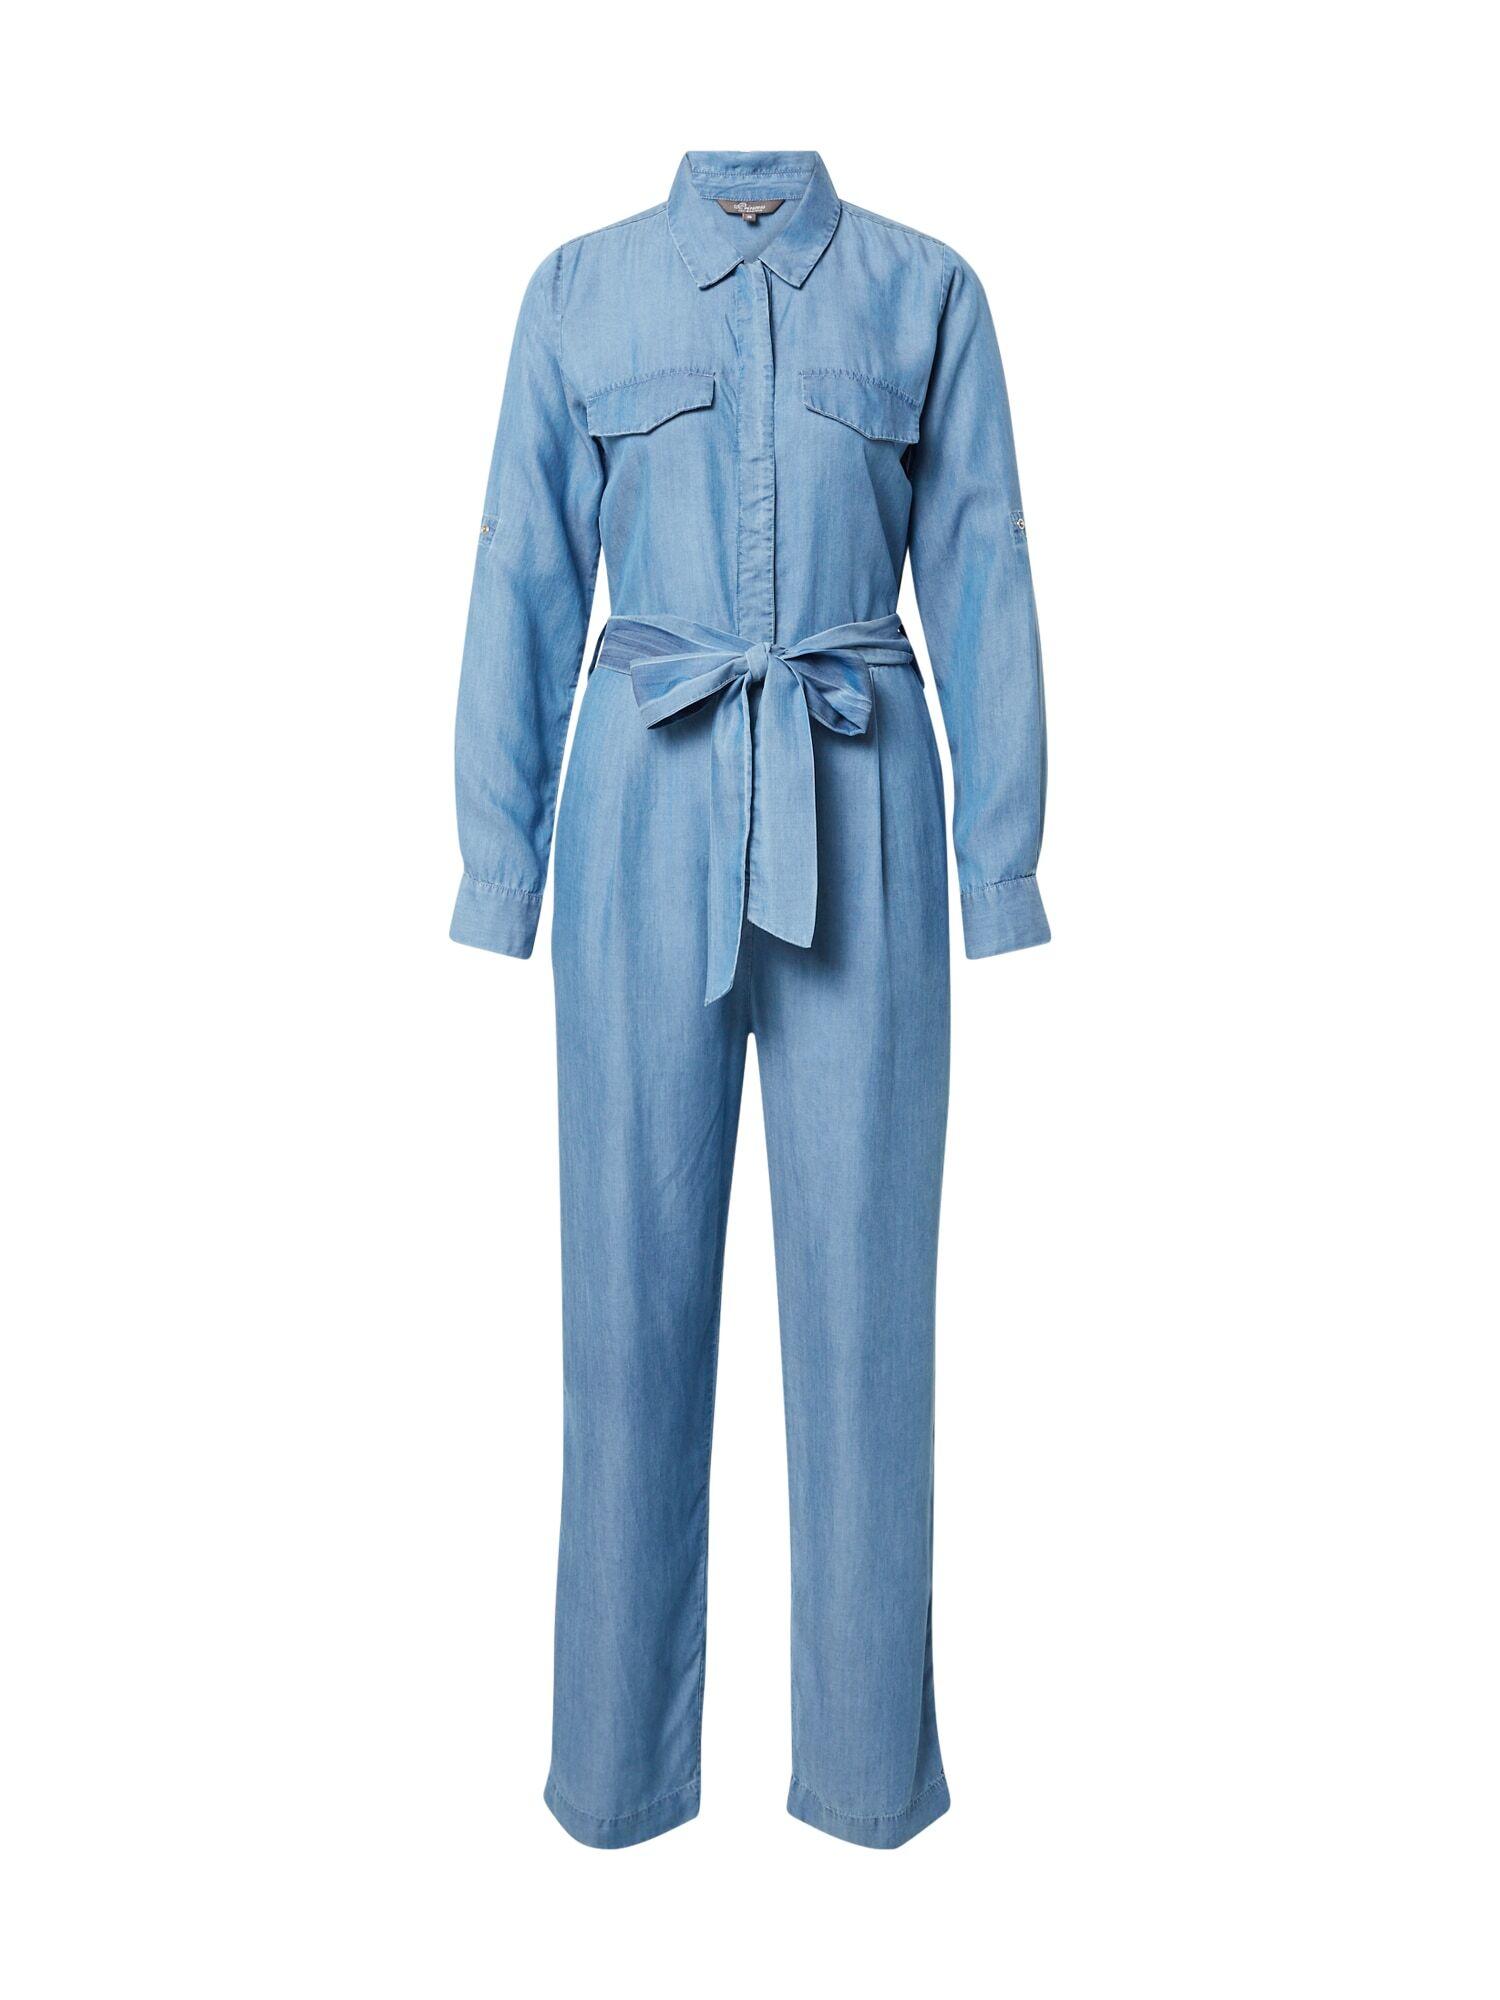 Princess Combinaison  - Bleu - Taille: 42 - female